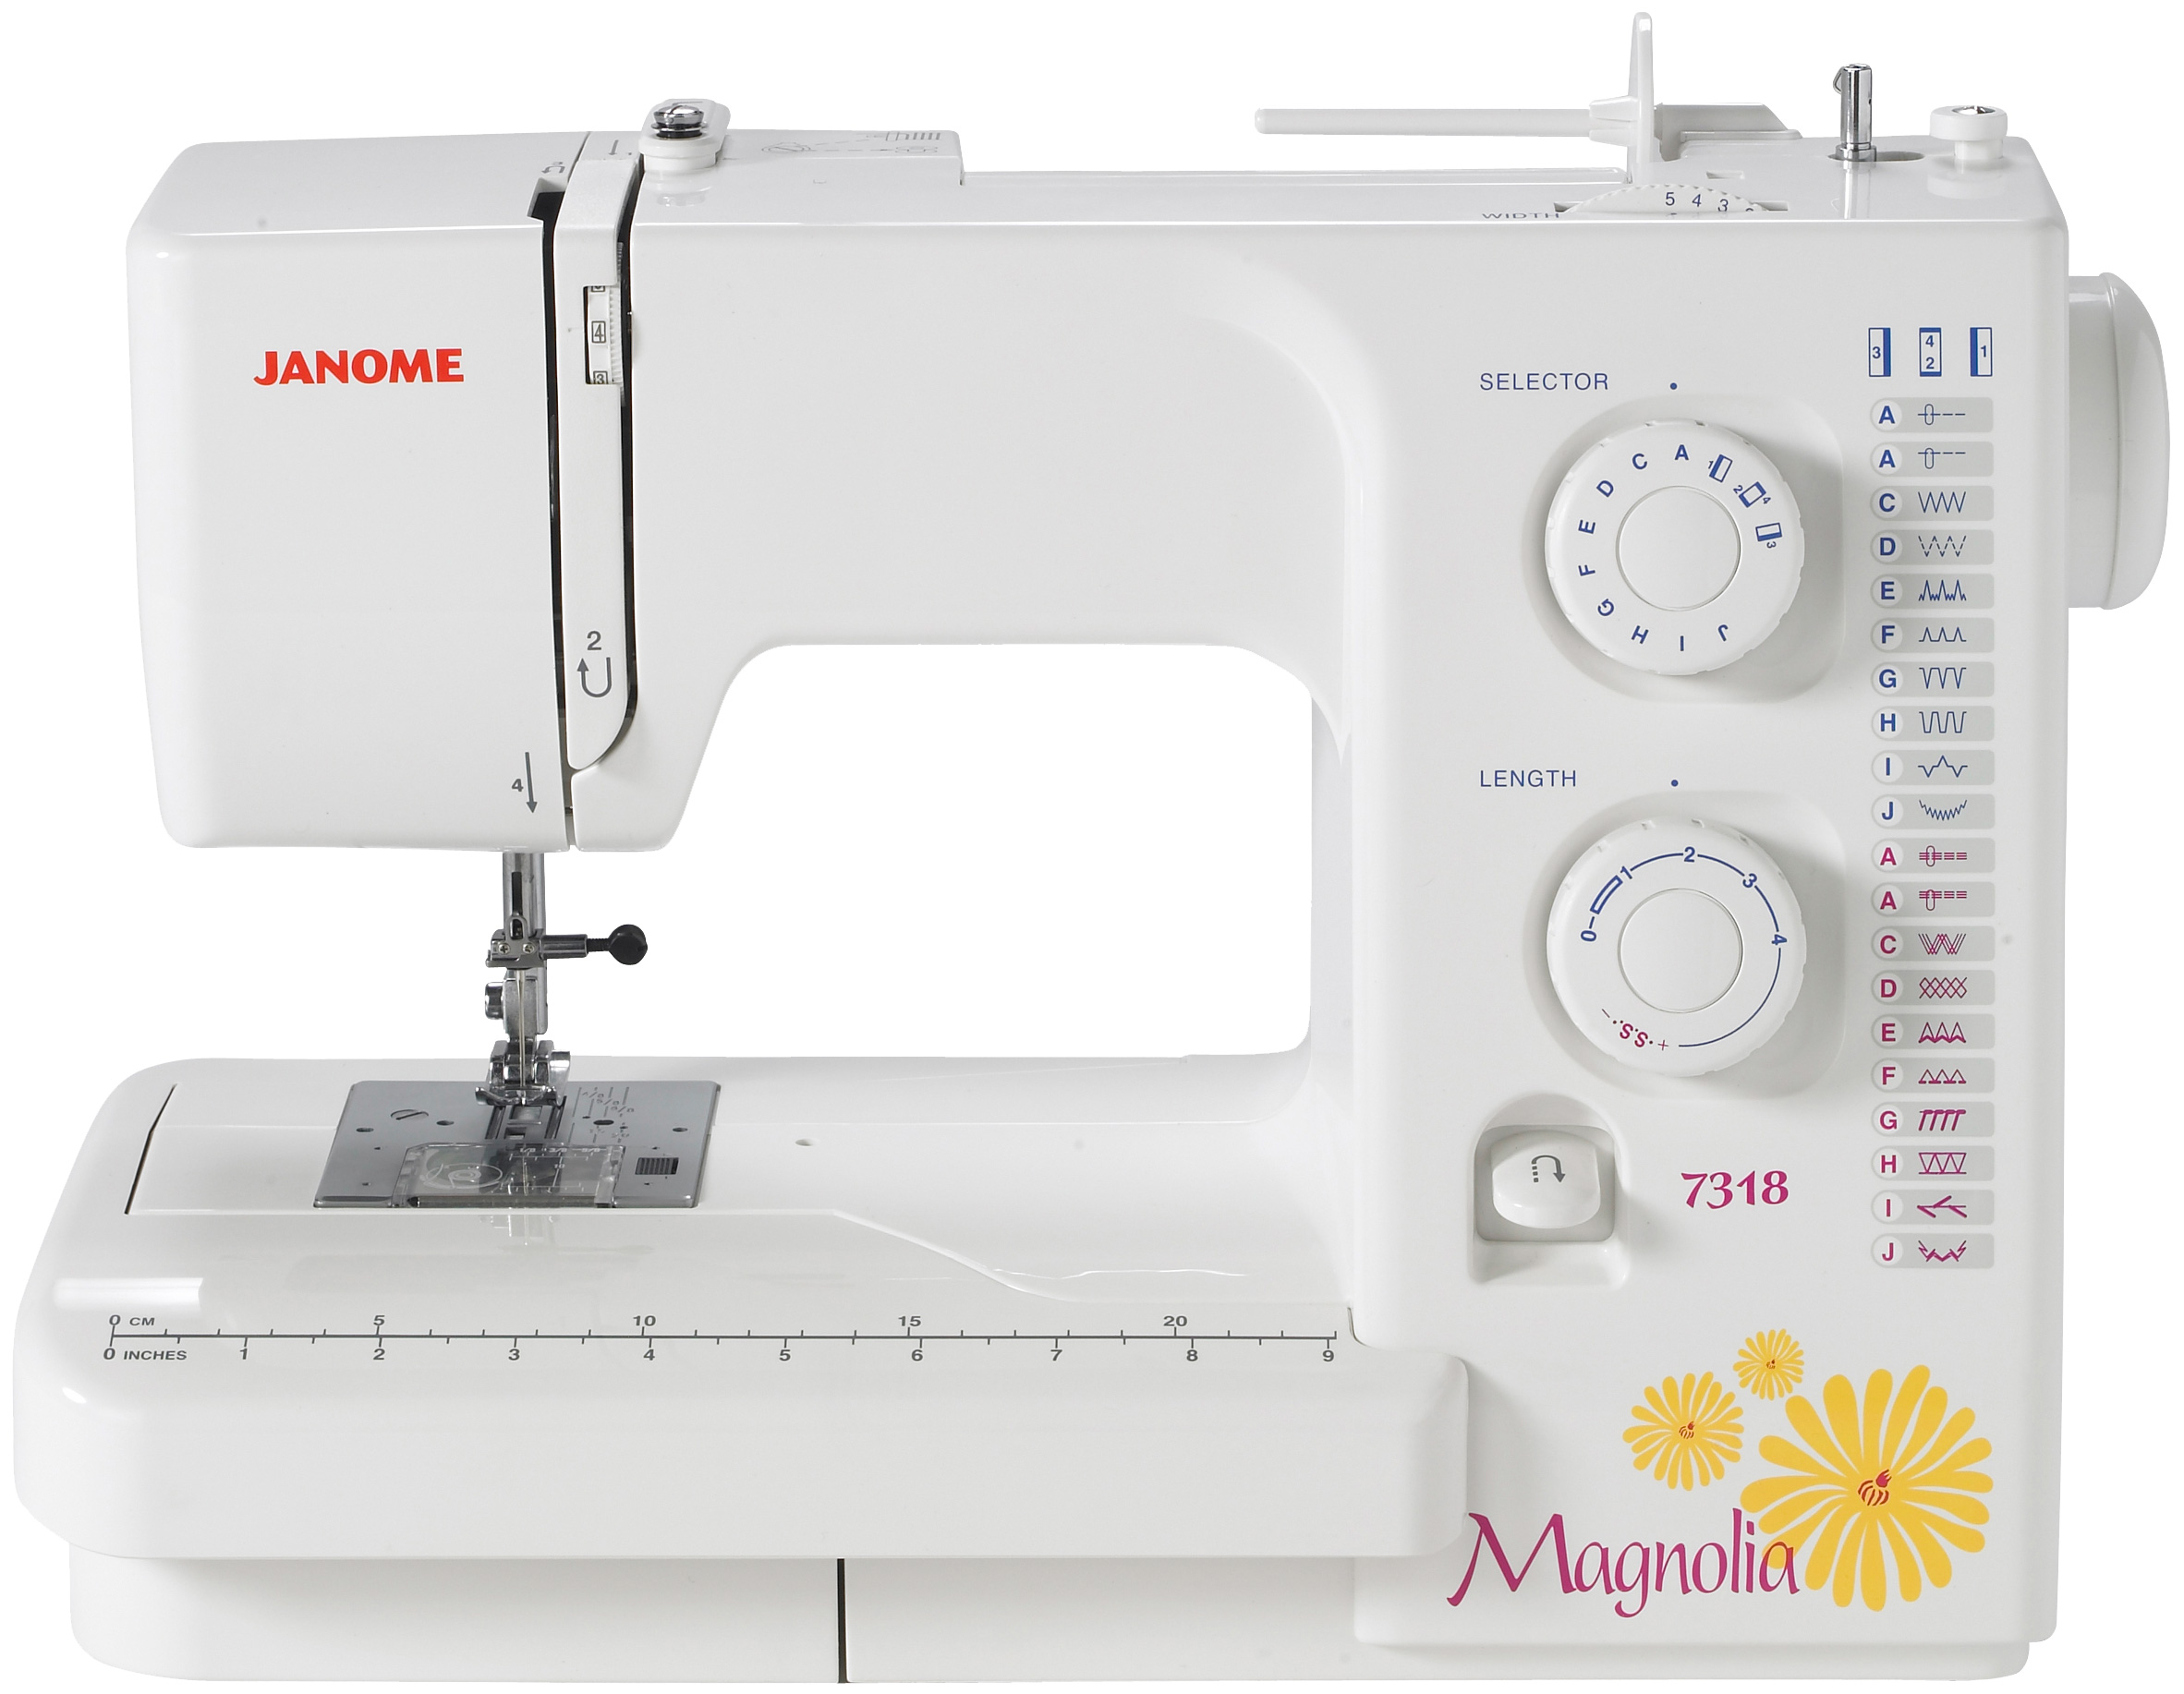 Refurbished Janome Magnolia 7318 Sewing Machine